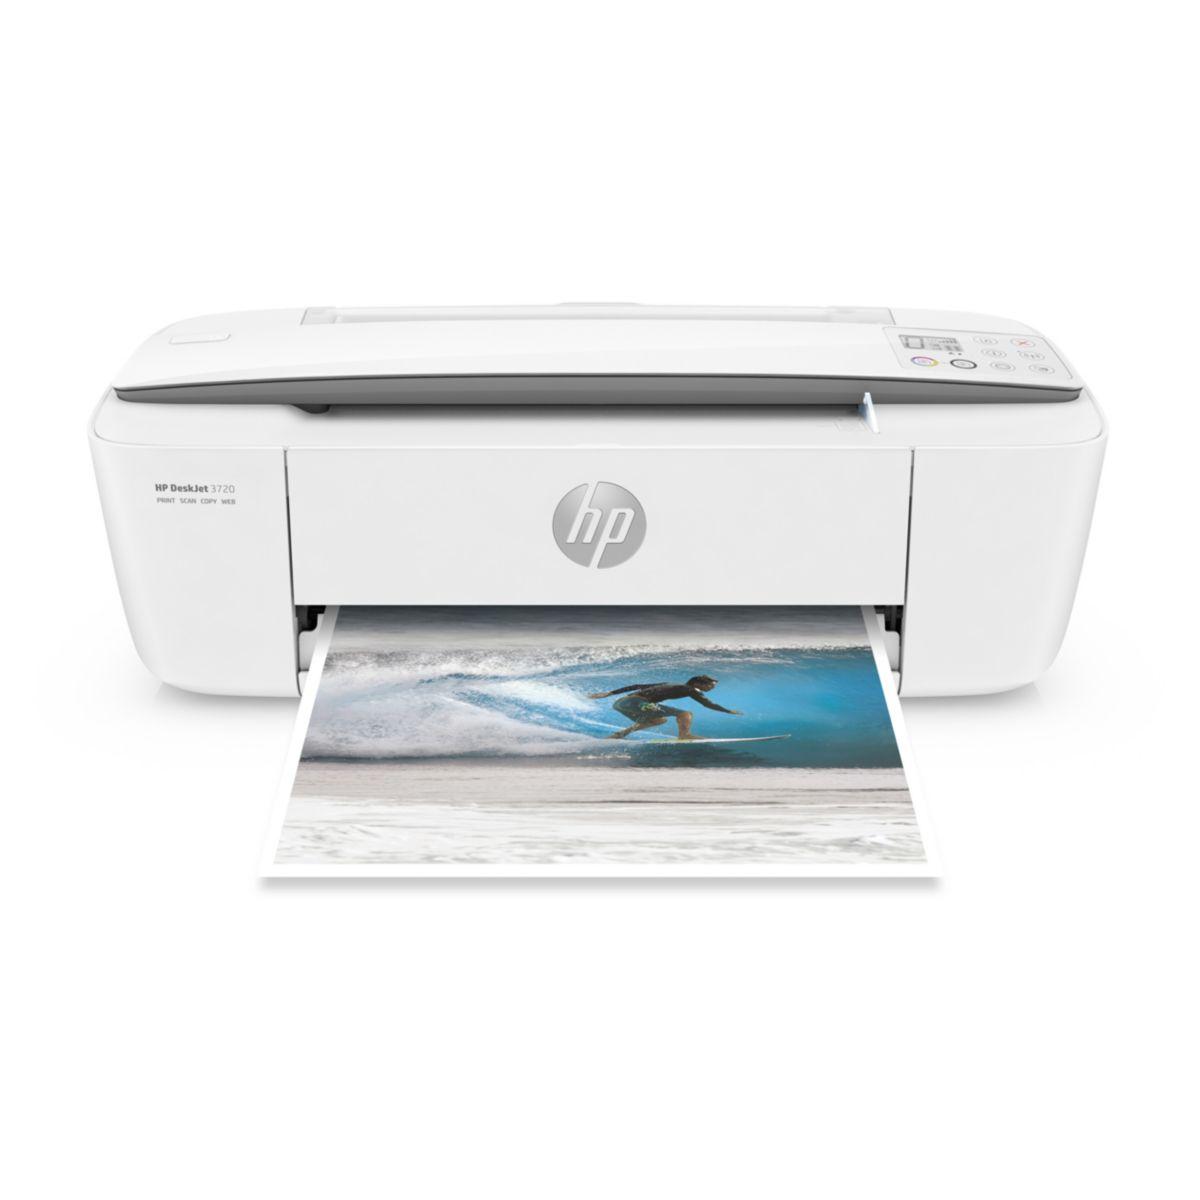 Imprimante jet d'encre HP Deskjet 3720 Blanc (photo)